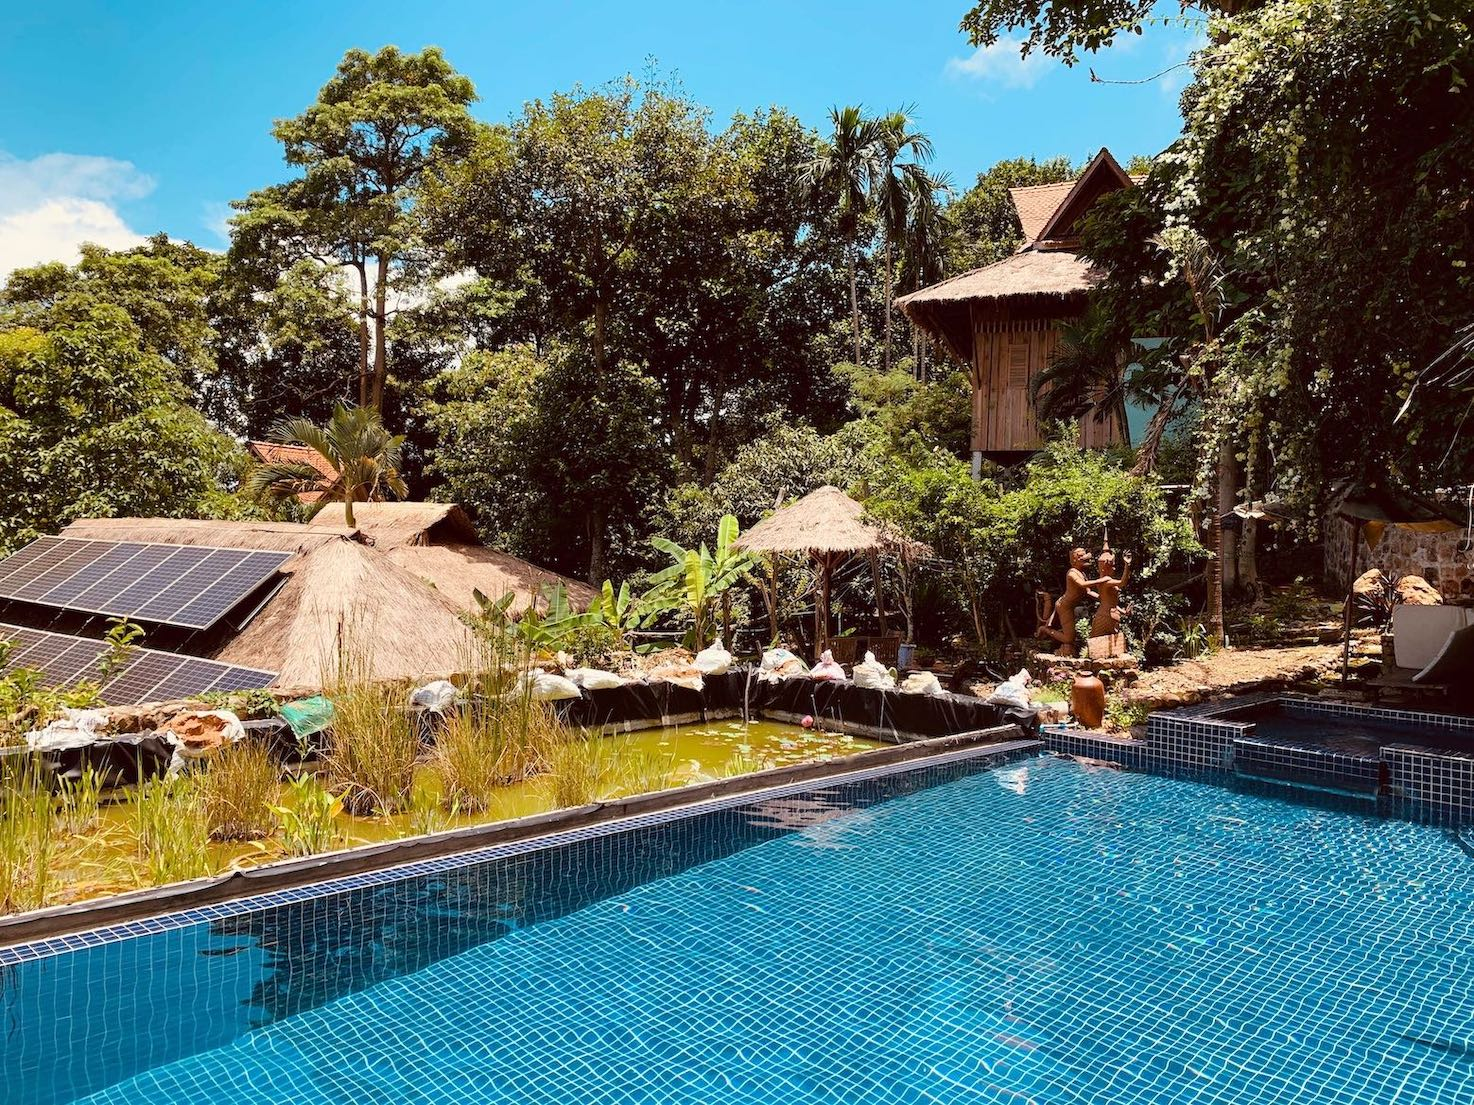 Swimming pool Le Bout du Monde Hotel Kep